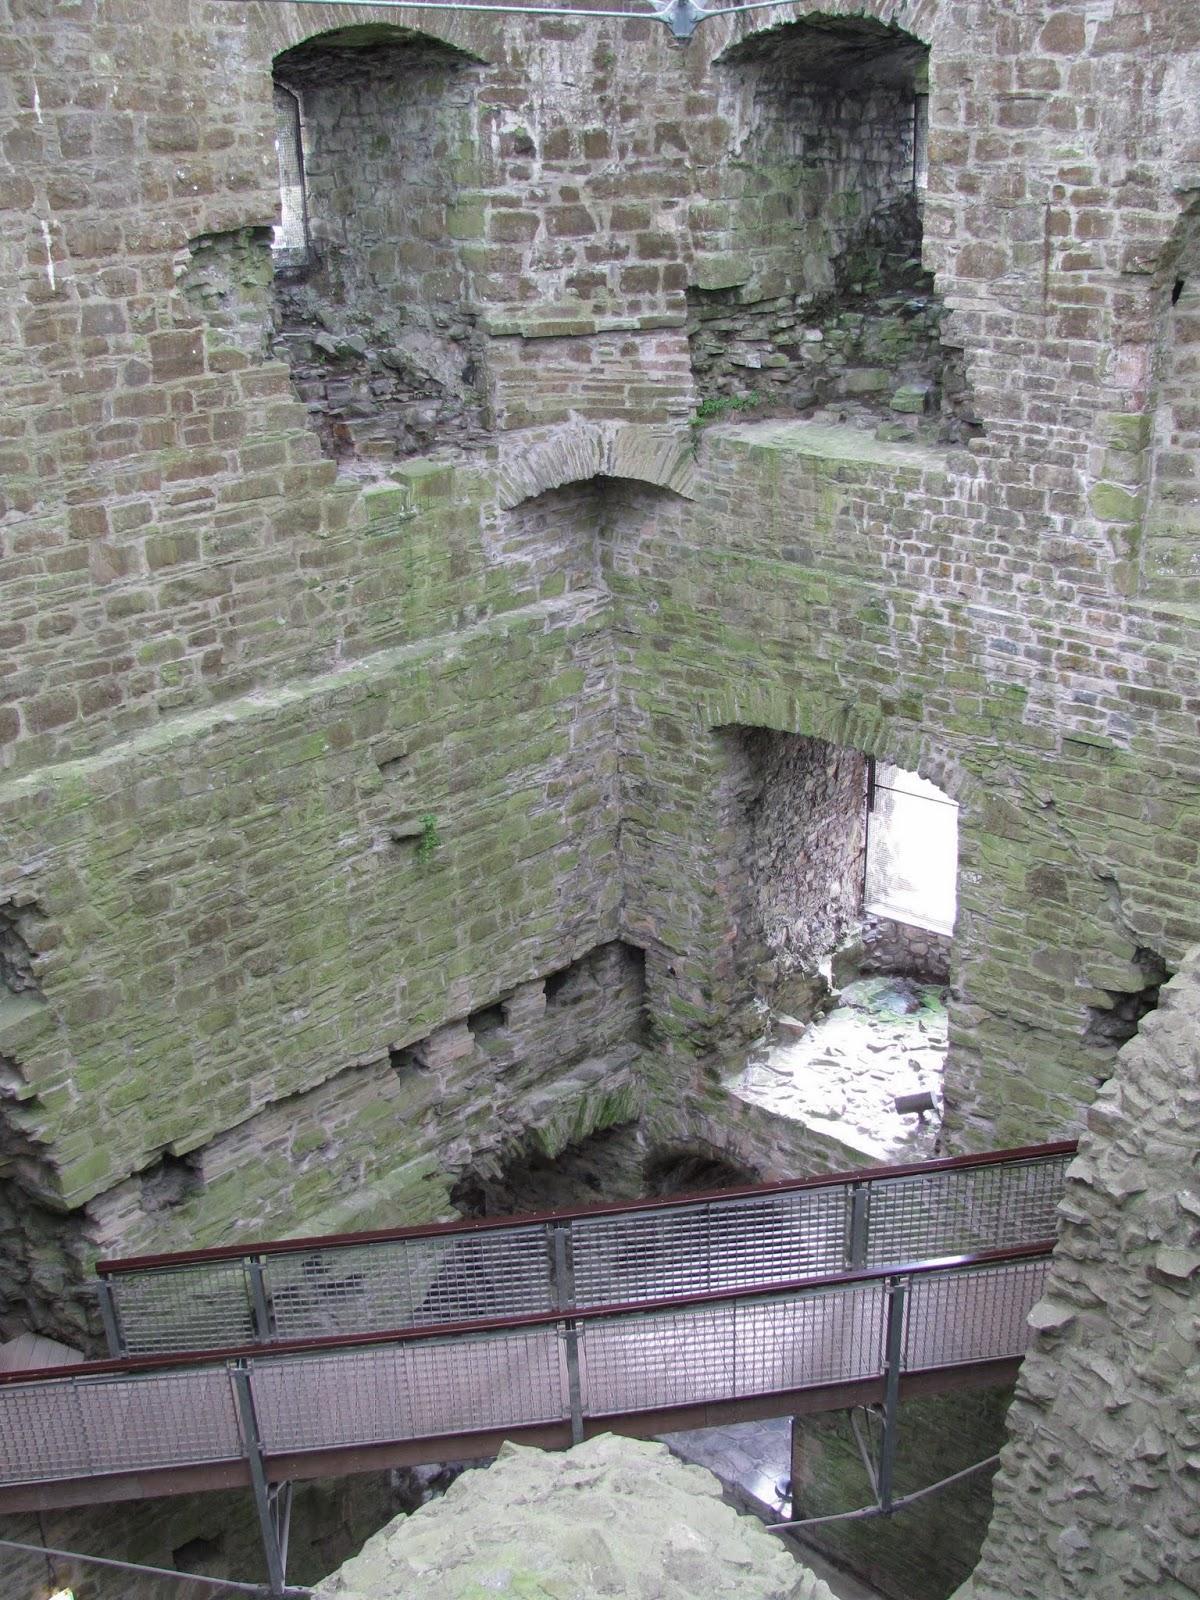 Trim Castle keep central structure, Trim, Ireland